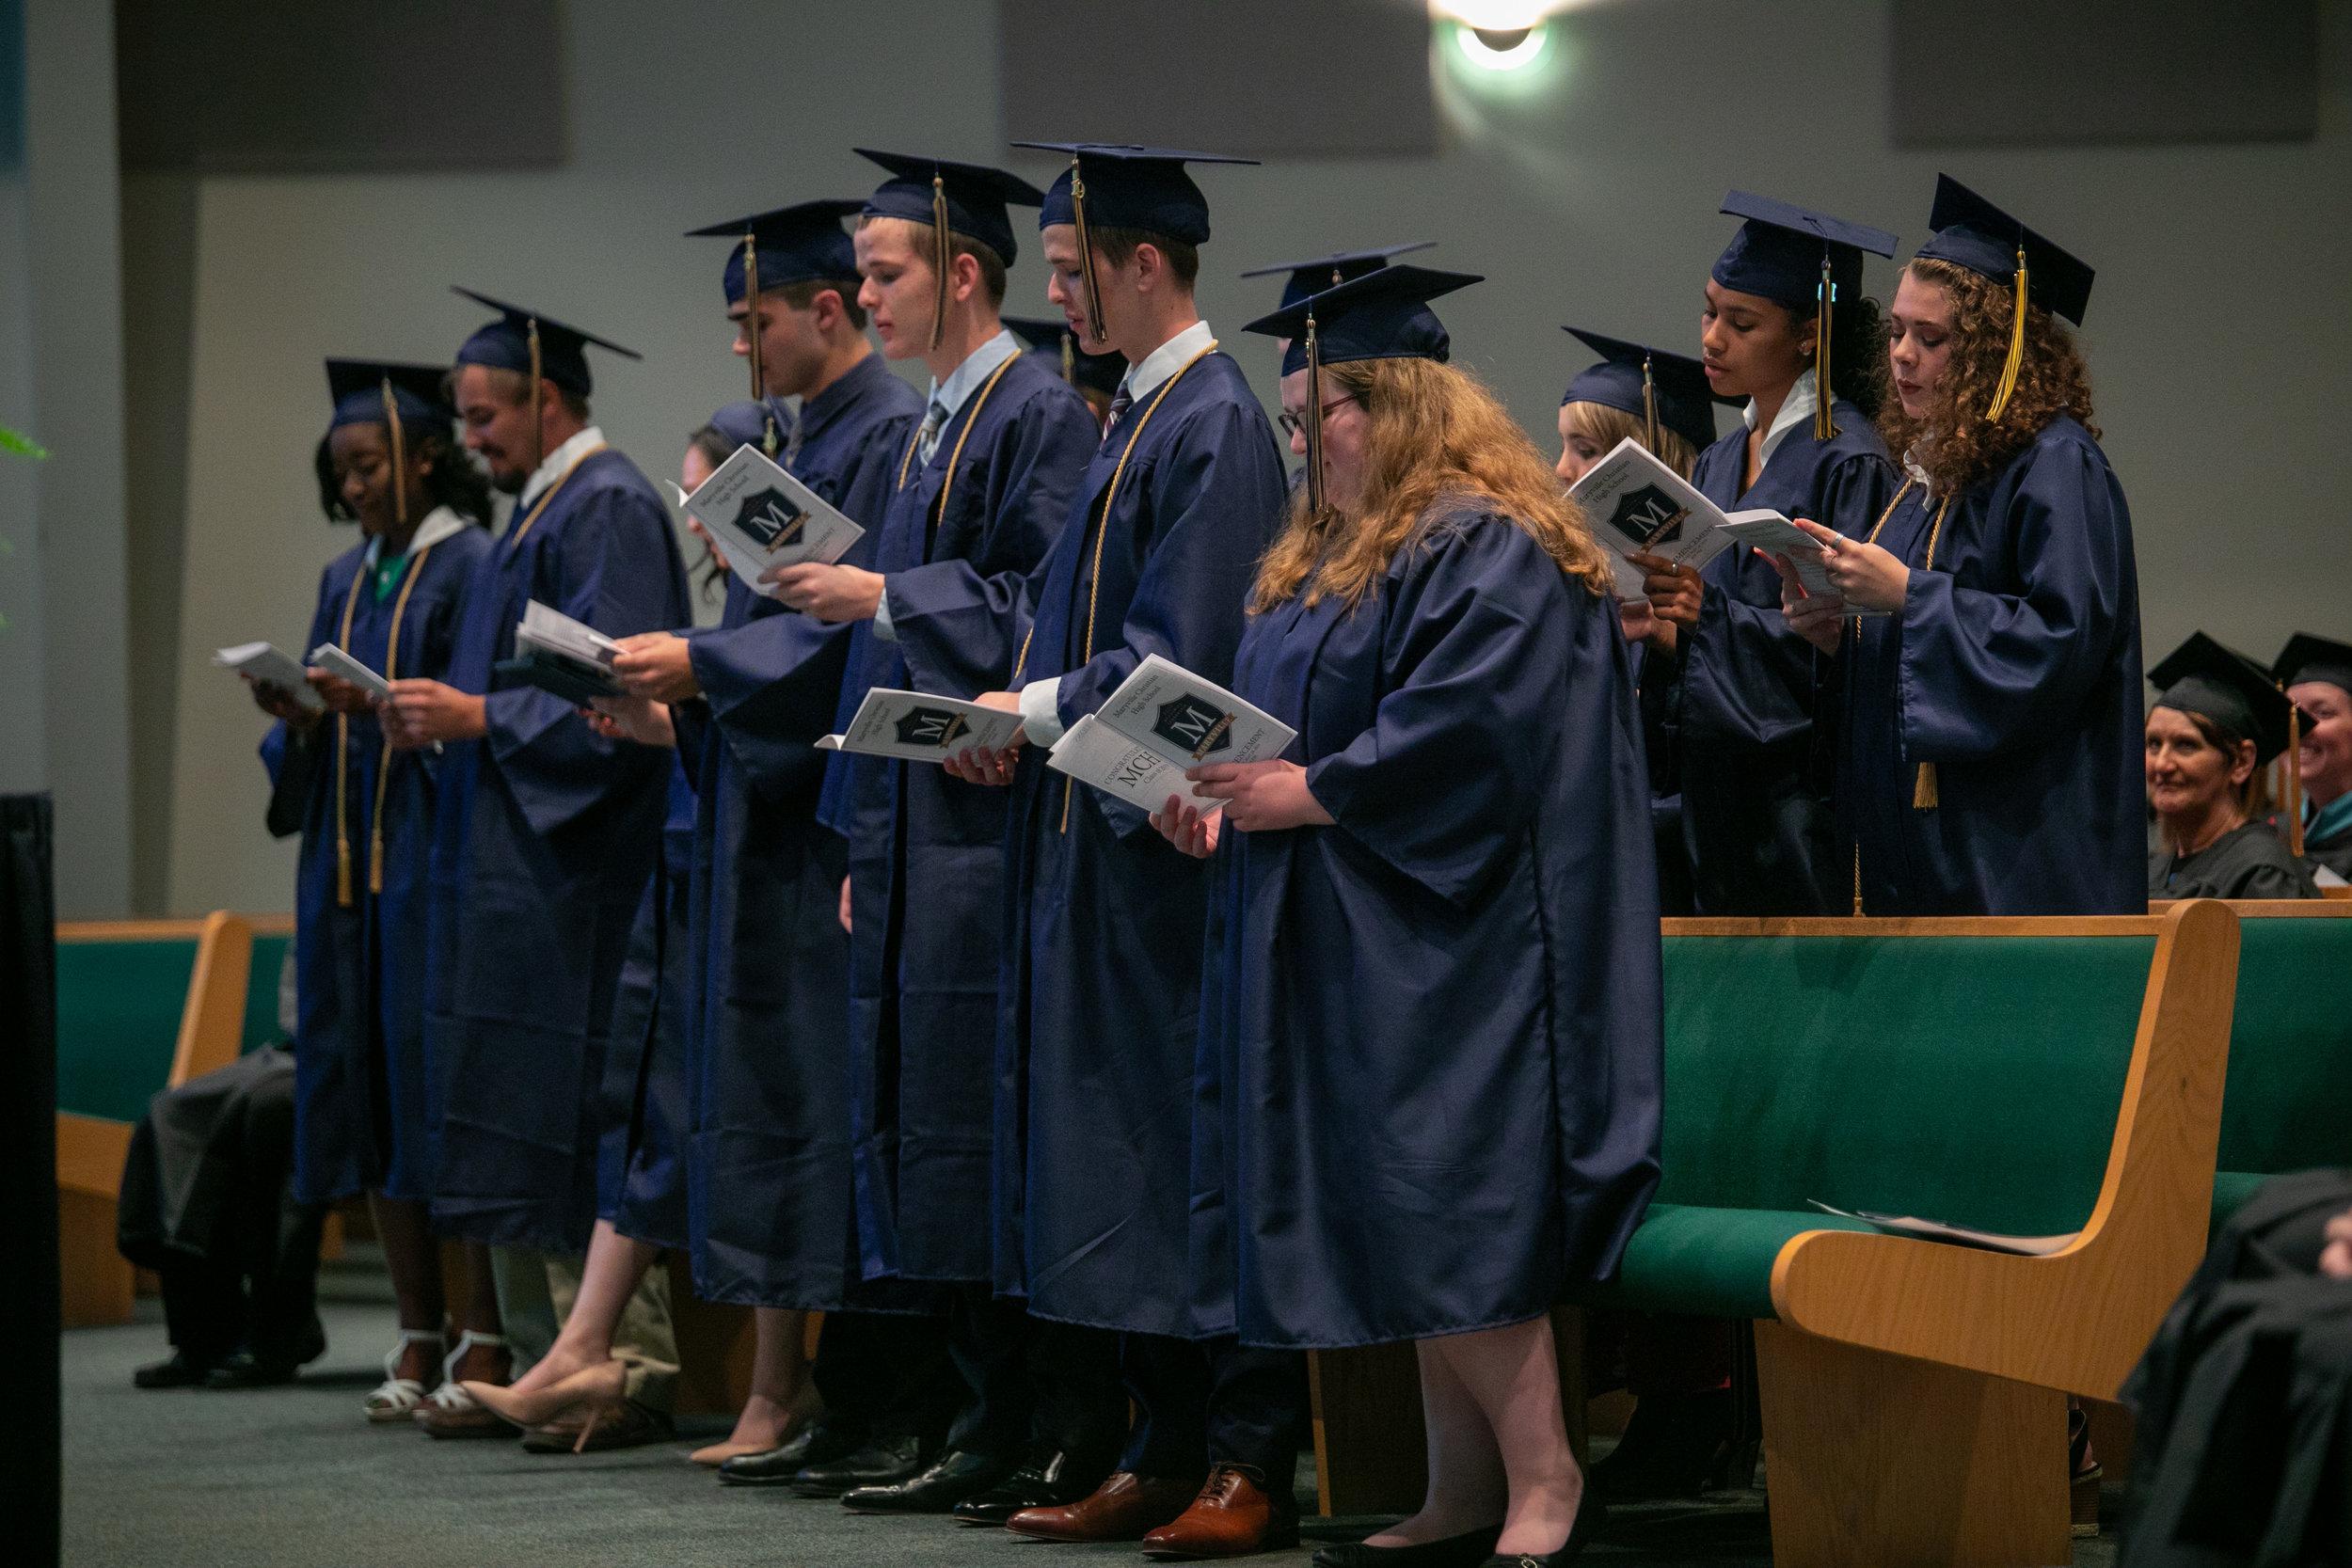 mchs_graduation_201910.JPG